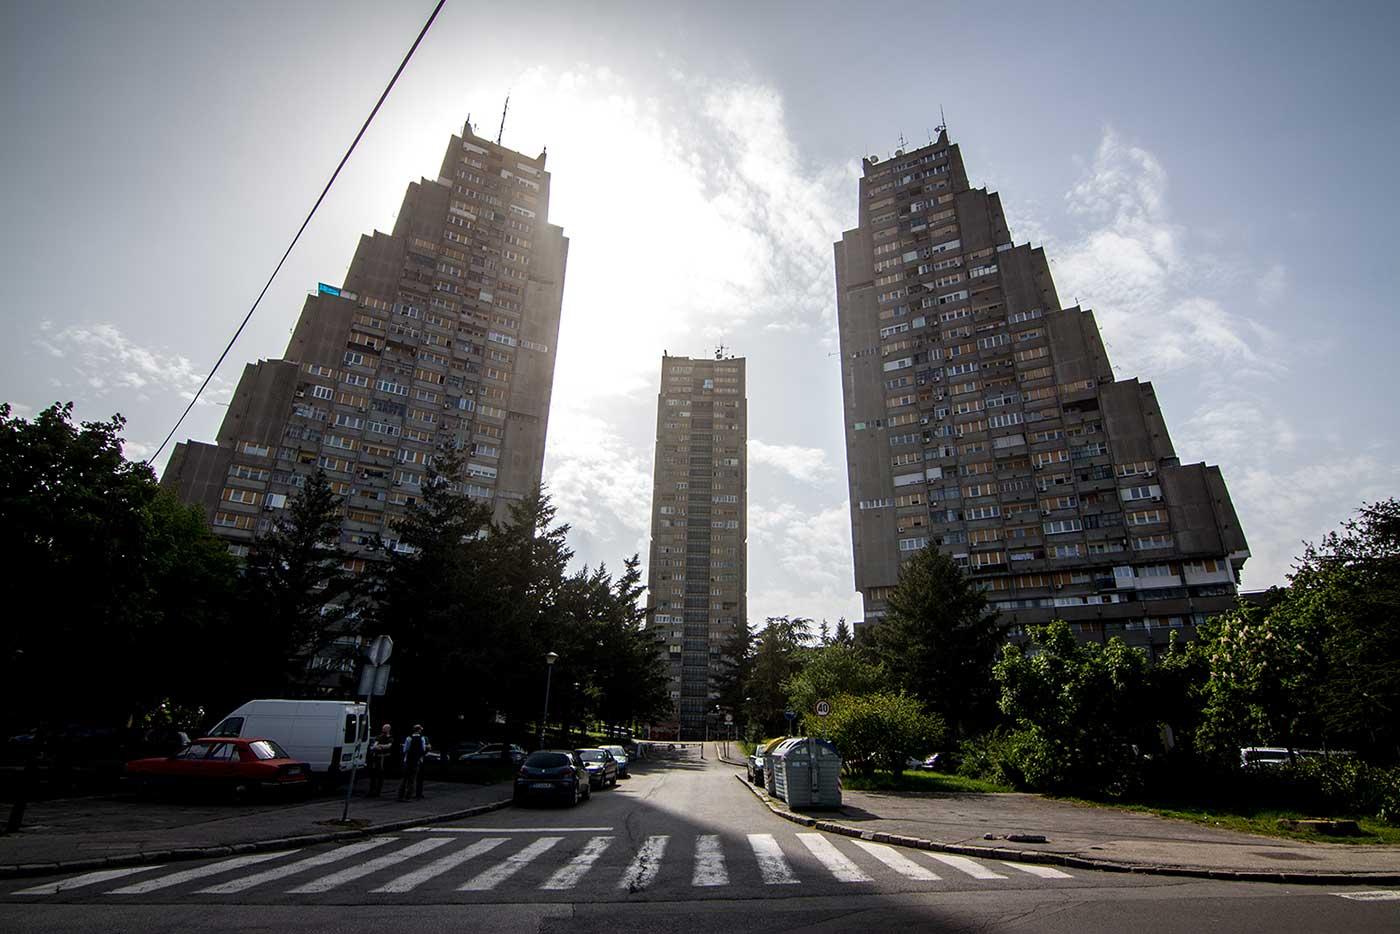 Eastern City Gate in Belgrade, Serbia (Vera Ćirković & Milutin Jerotijević, 1973-76).